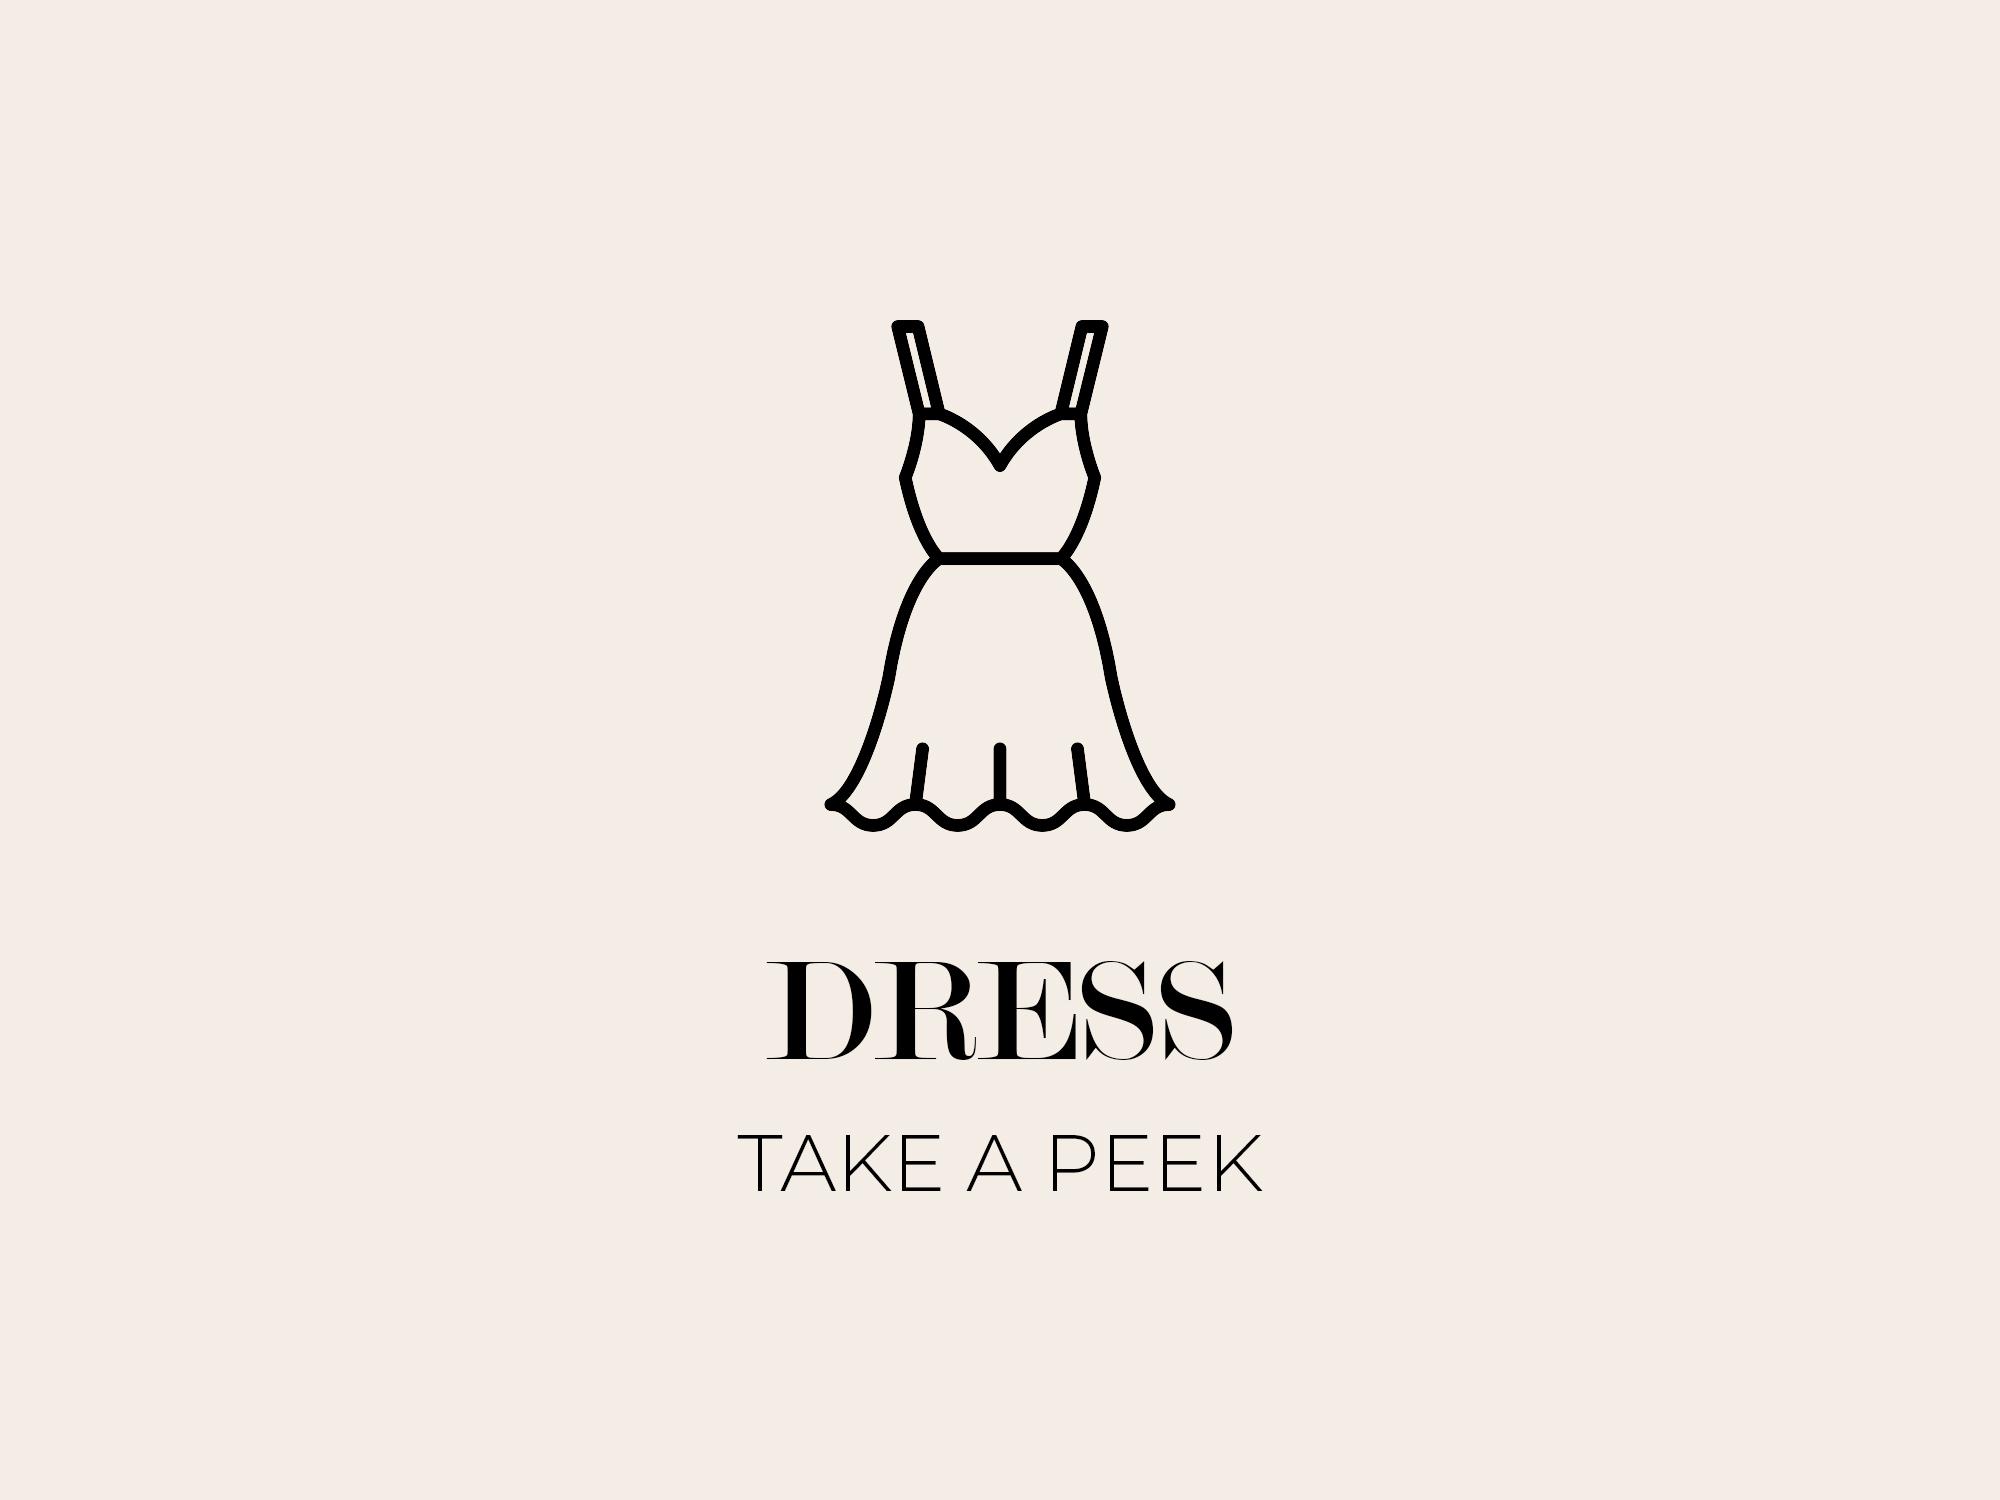 rent designer dress fir special occasion